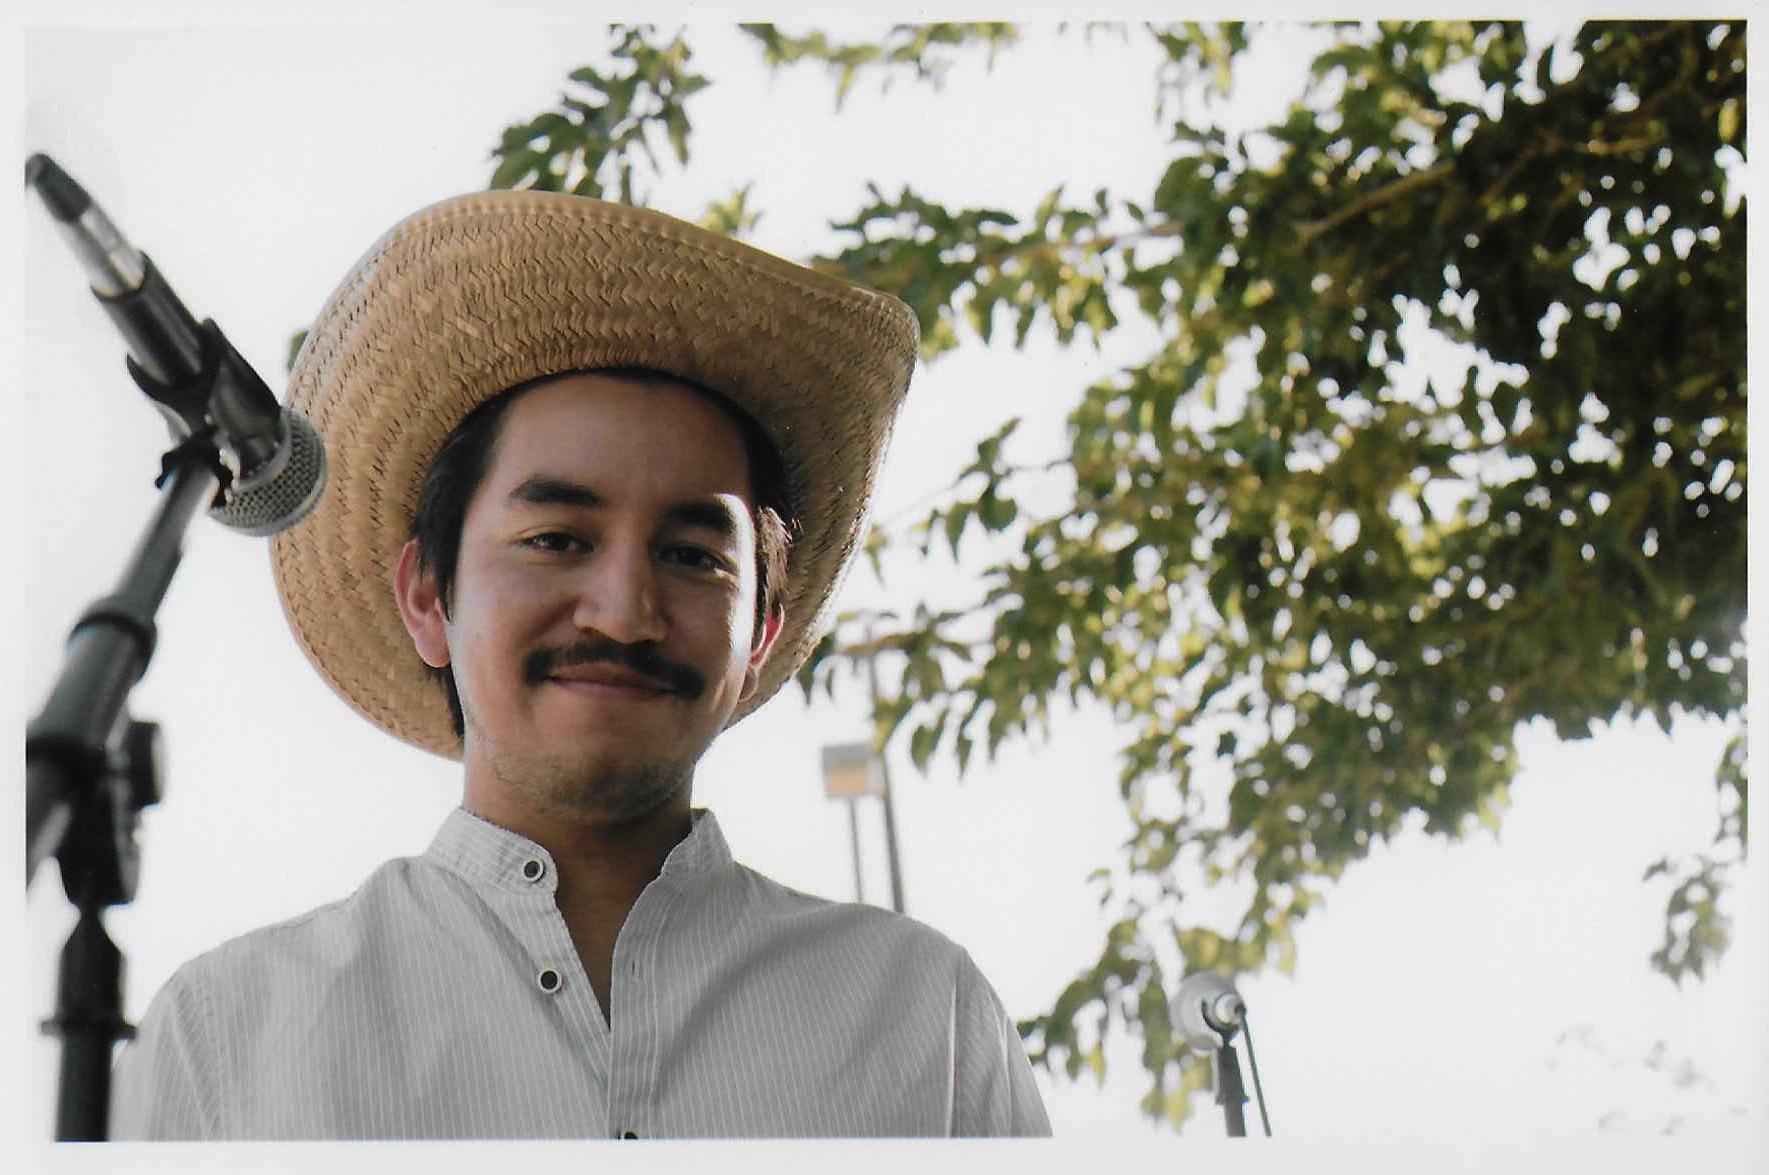 Gabriel Ramirez-Ortiz